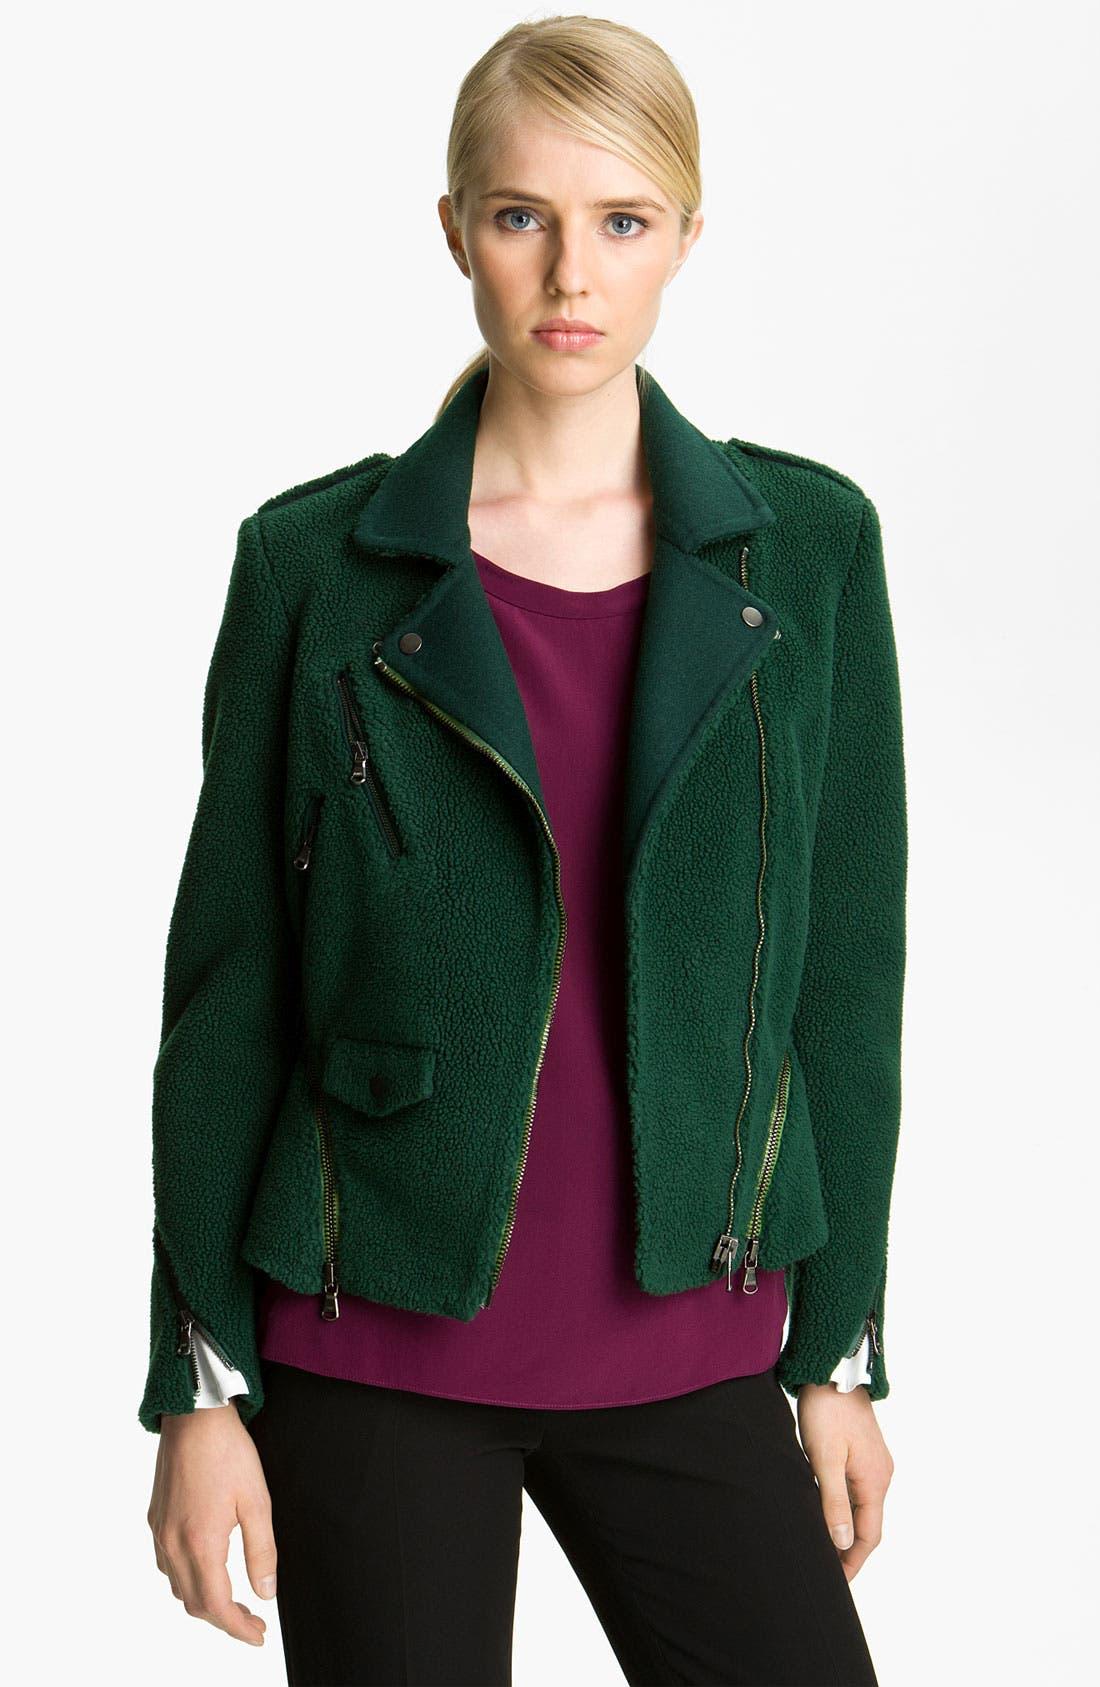 Alternate Image 1 Selected - 3.1 Phillip Lim Bonded Wool Moto Jacket